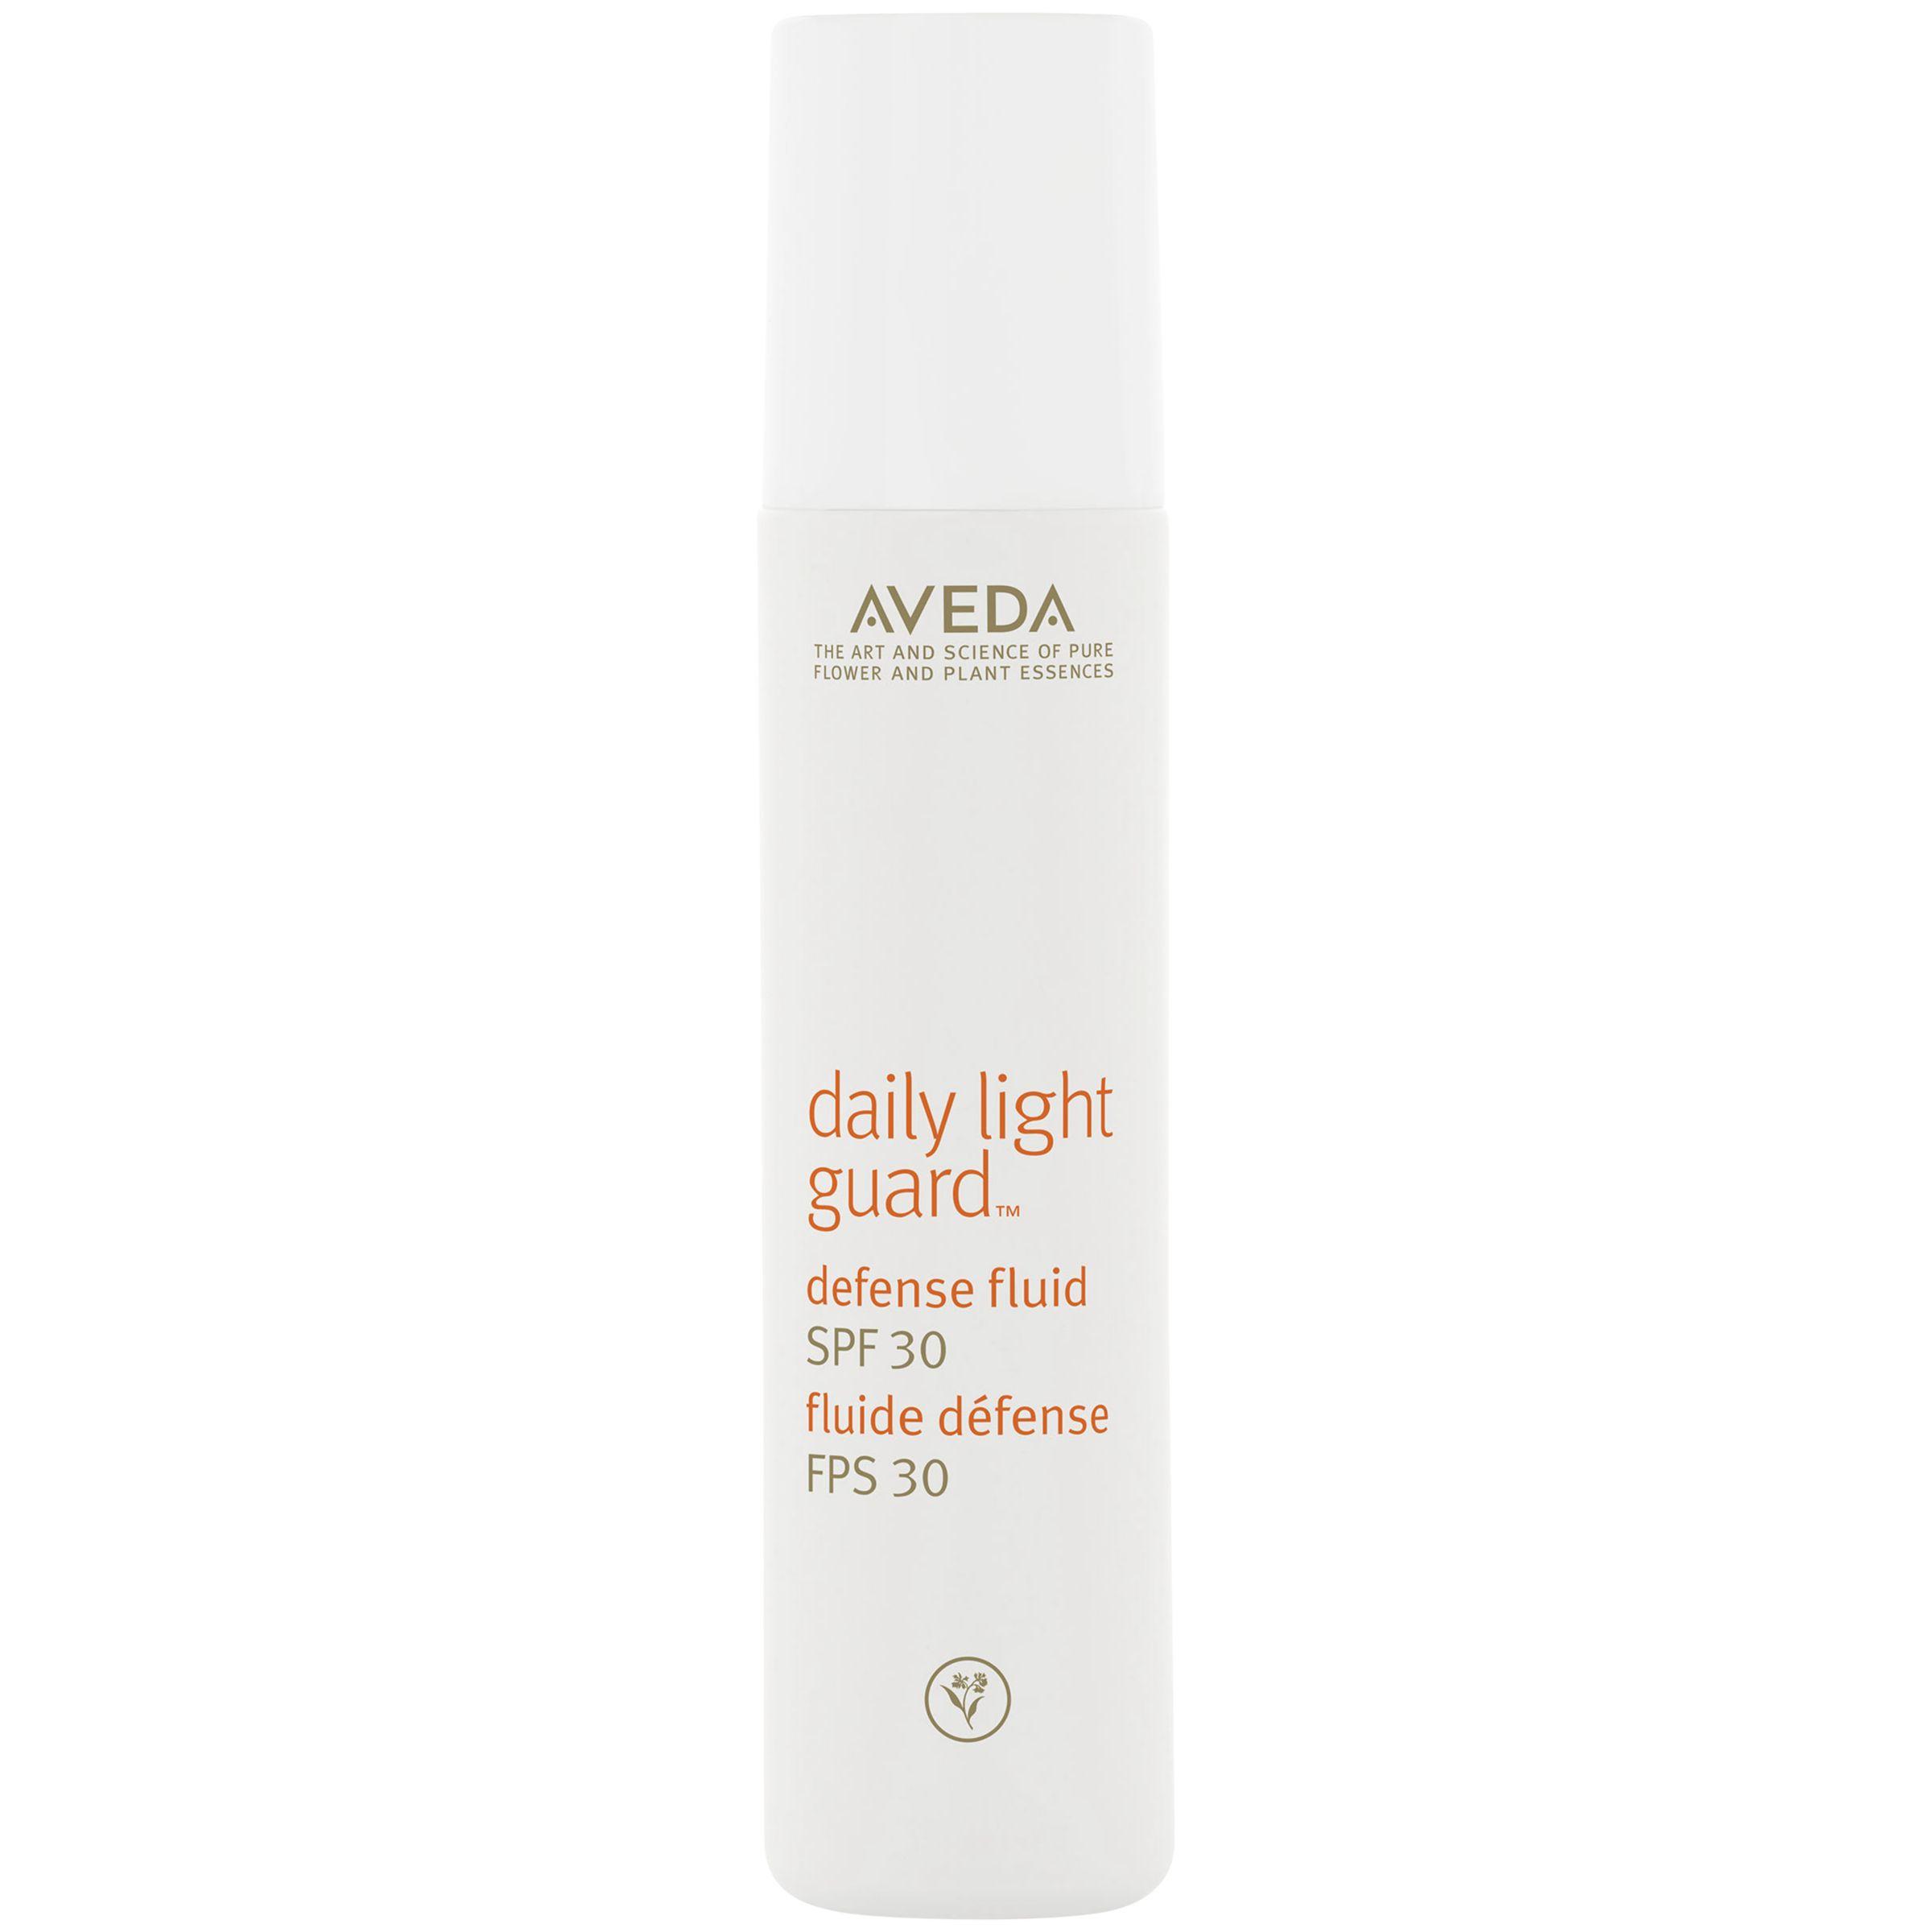 AVEDA AVEDA Daily Light Guard SPF 30, 30ml